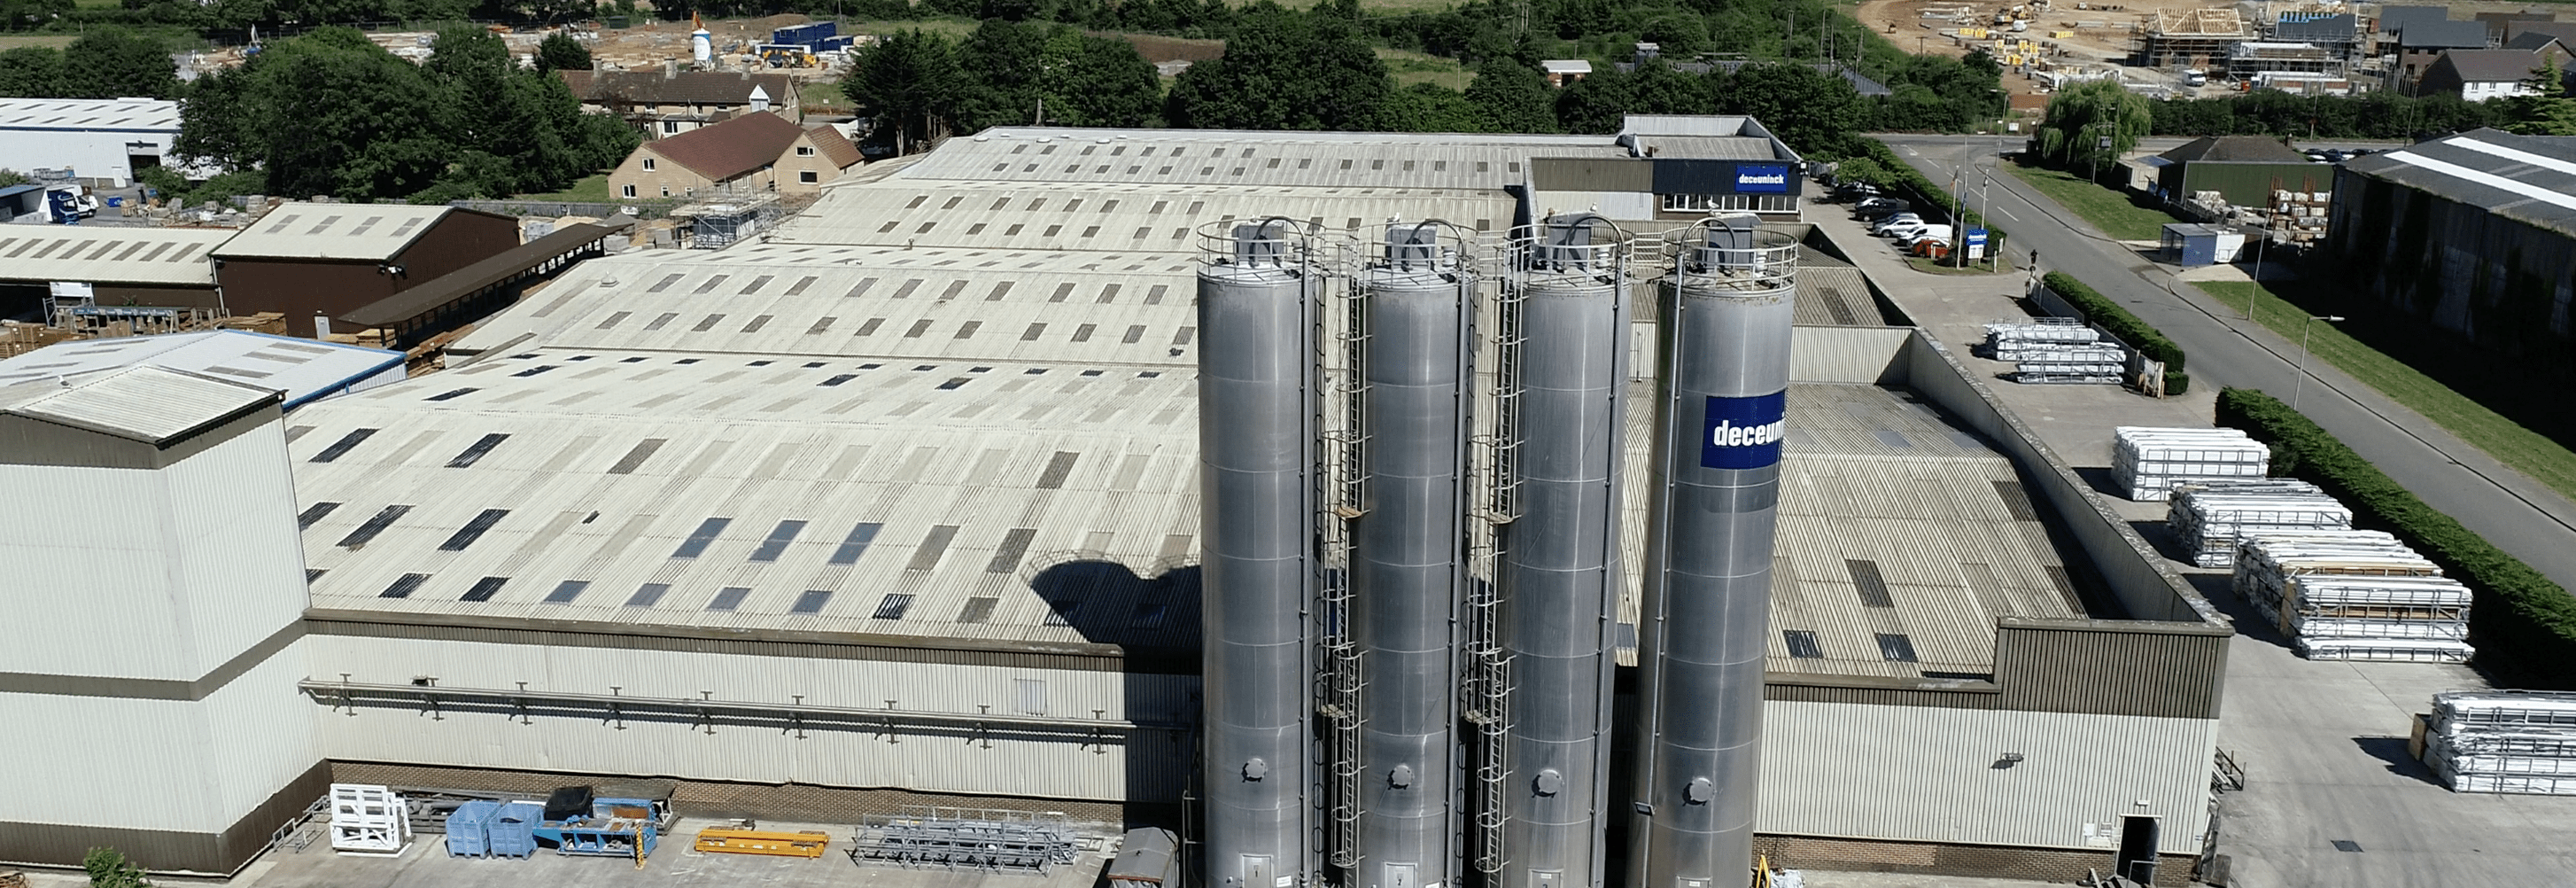 Deceuninck aerial view